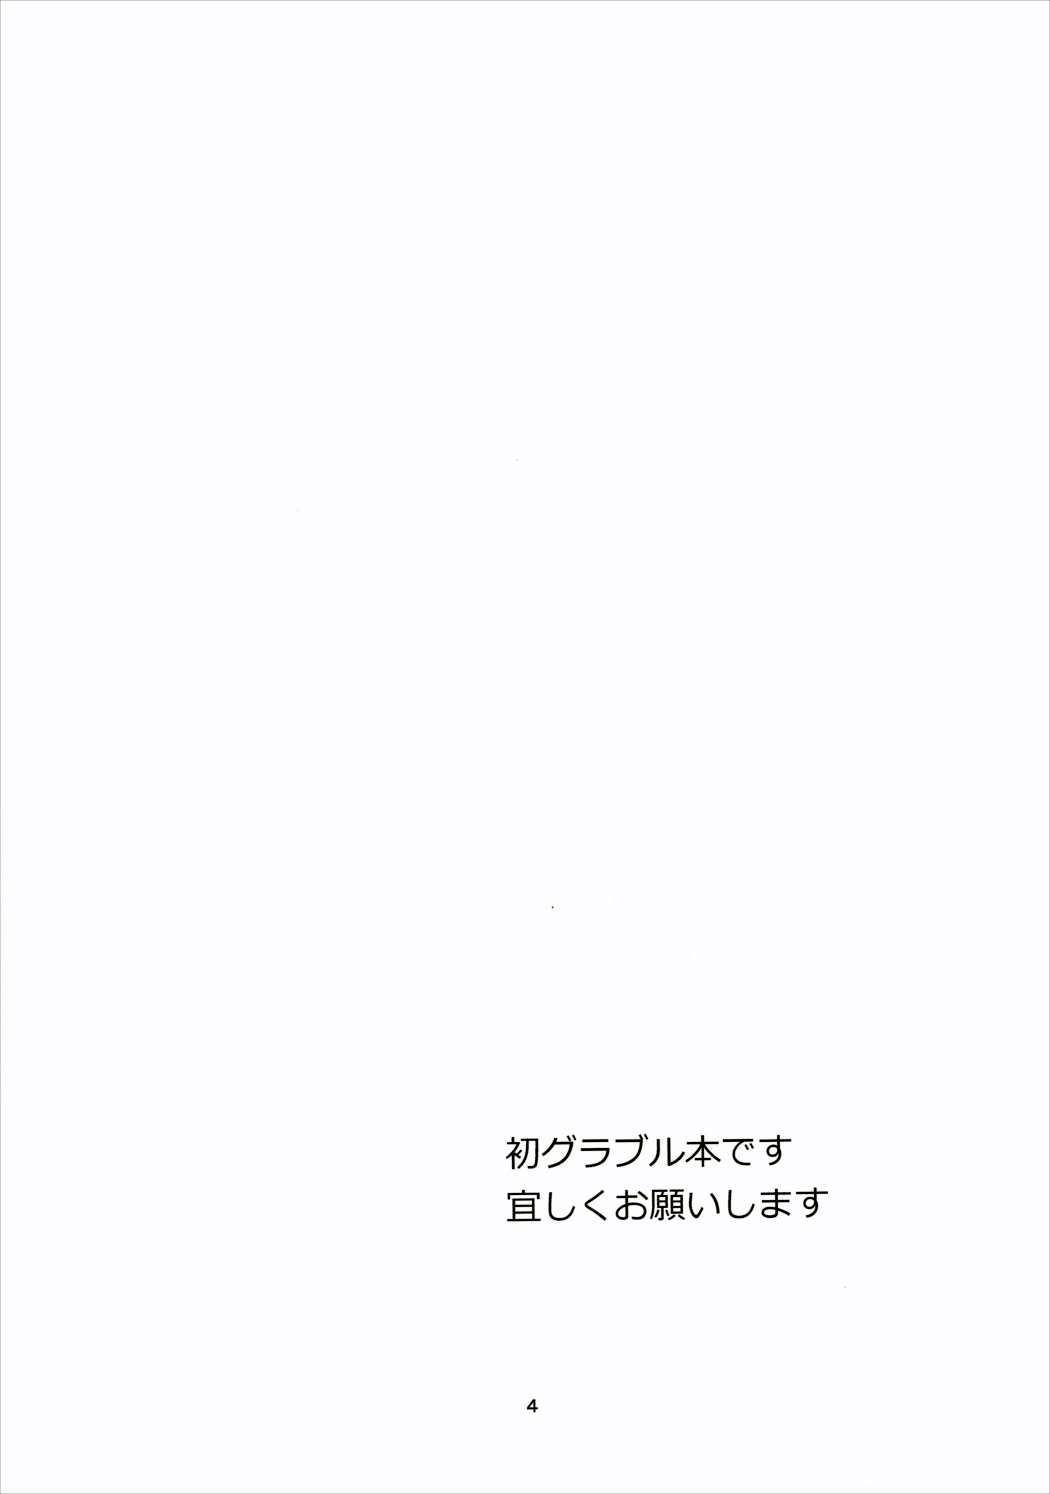 Zeta-chan ni Prominence Aibu 2